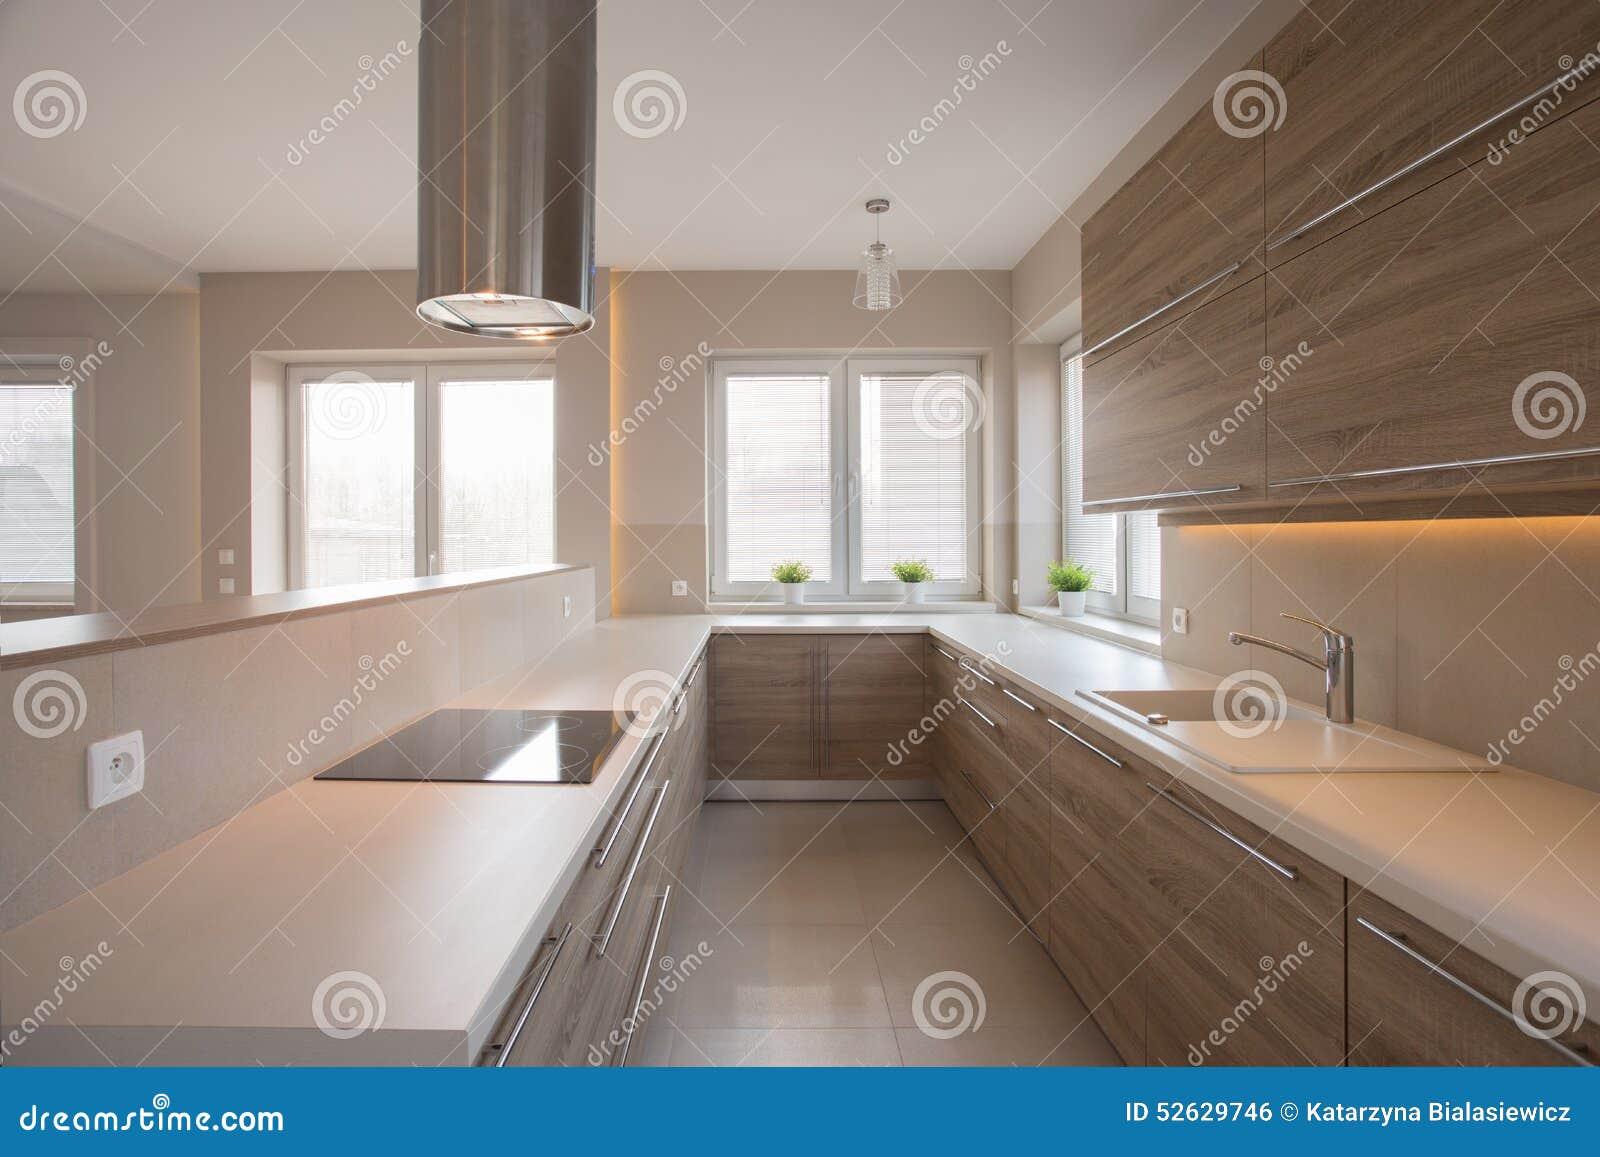 Houten keukenkasten royalty vrije stock foto's   afbeelding: 7278048